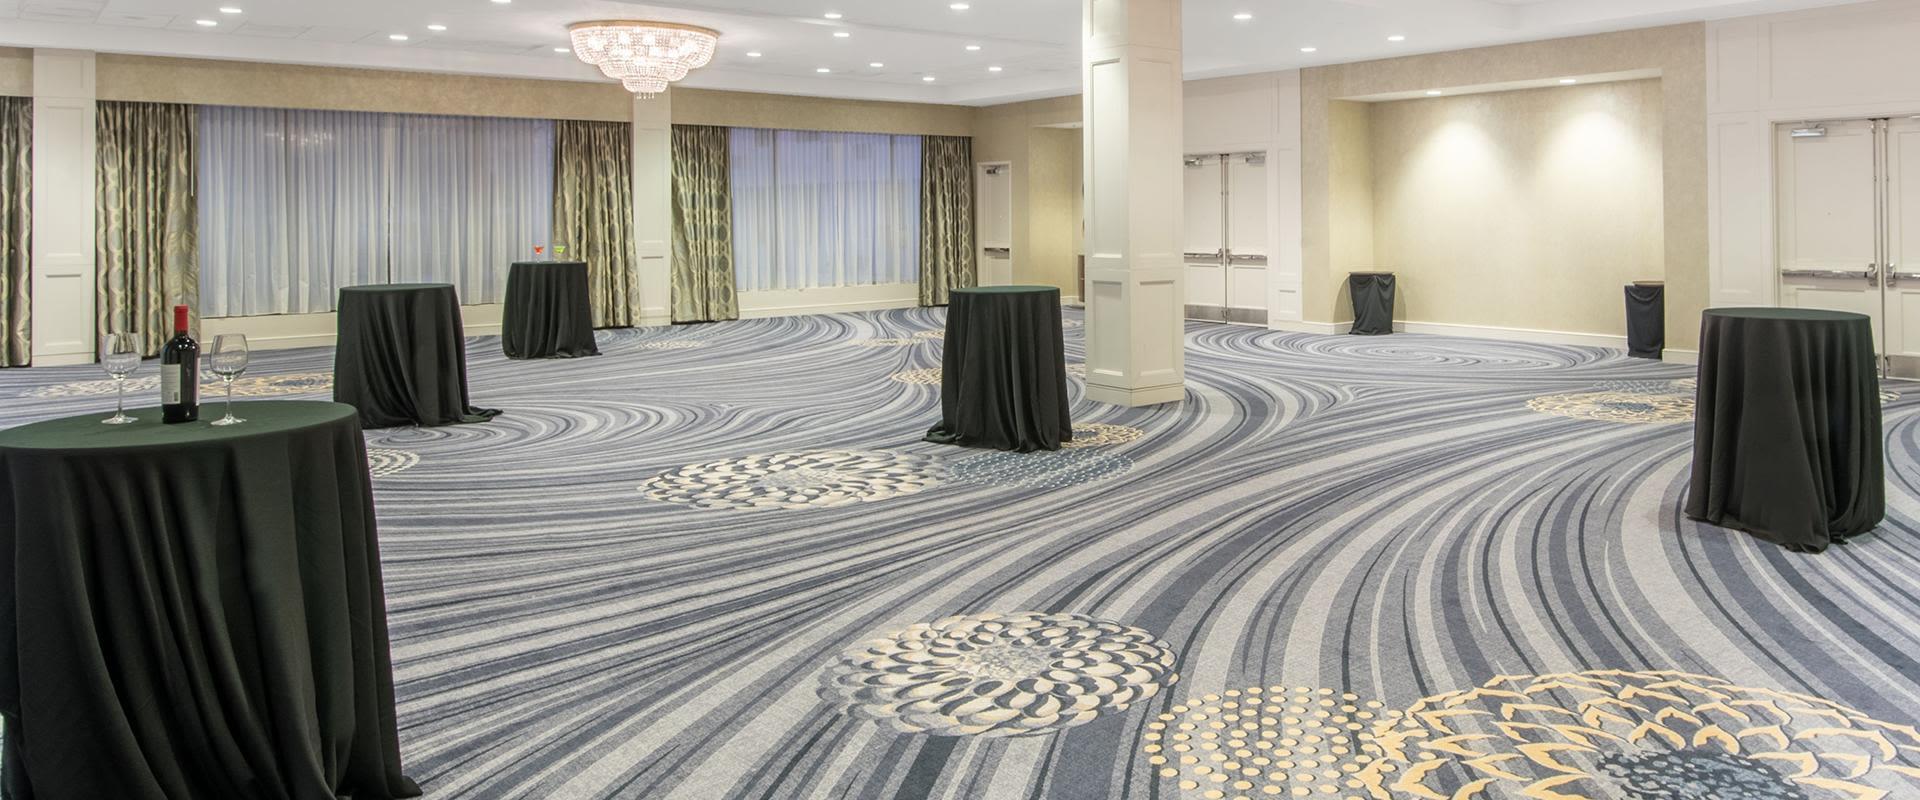 Charlotte Hotel Ballroom Cocktail Reception Venue